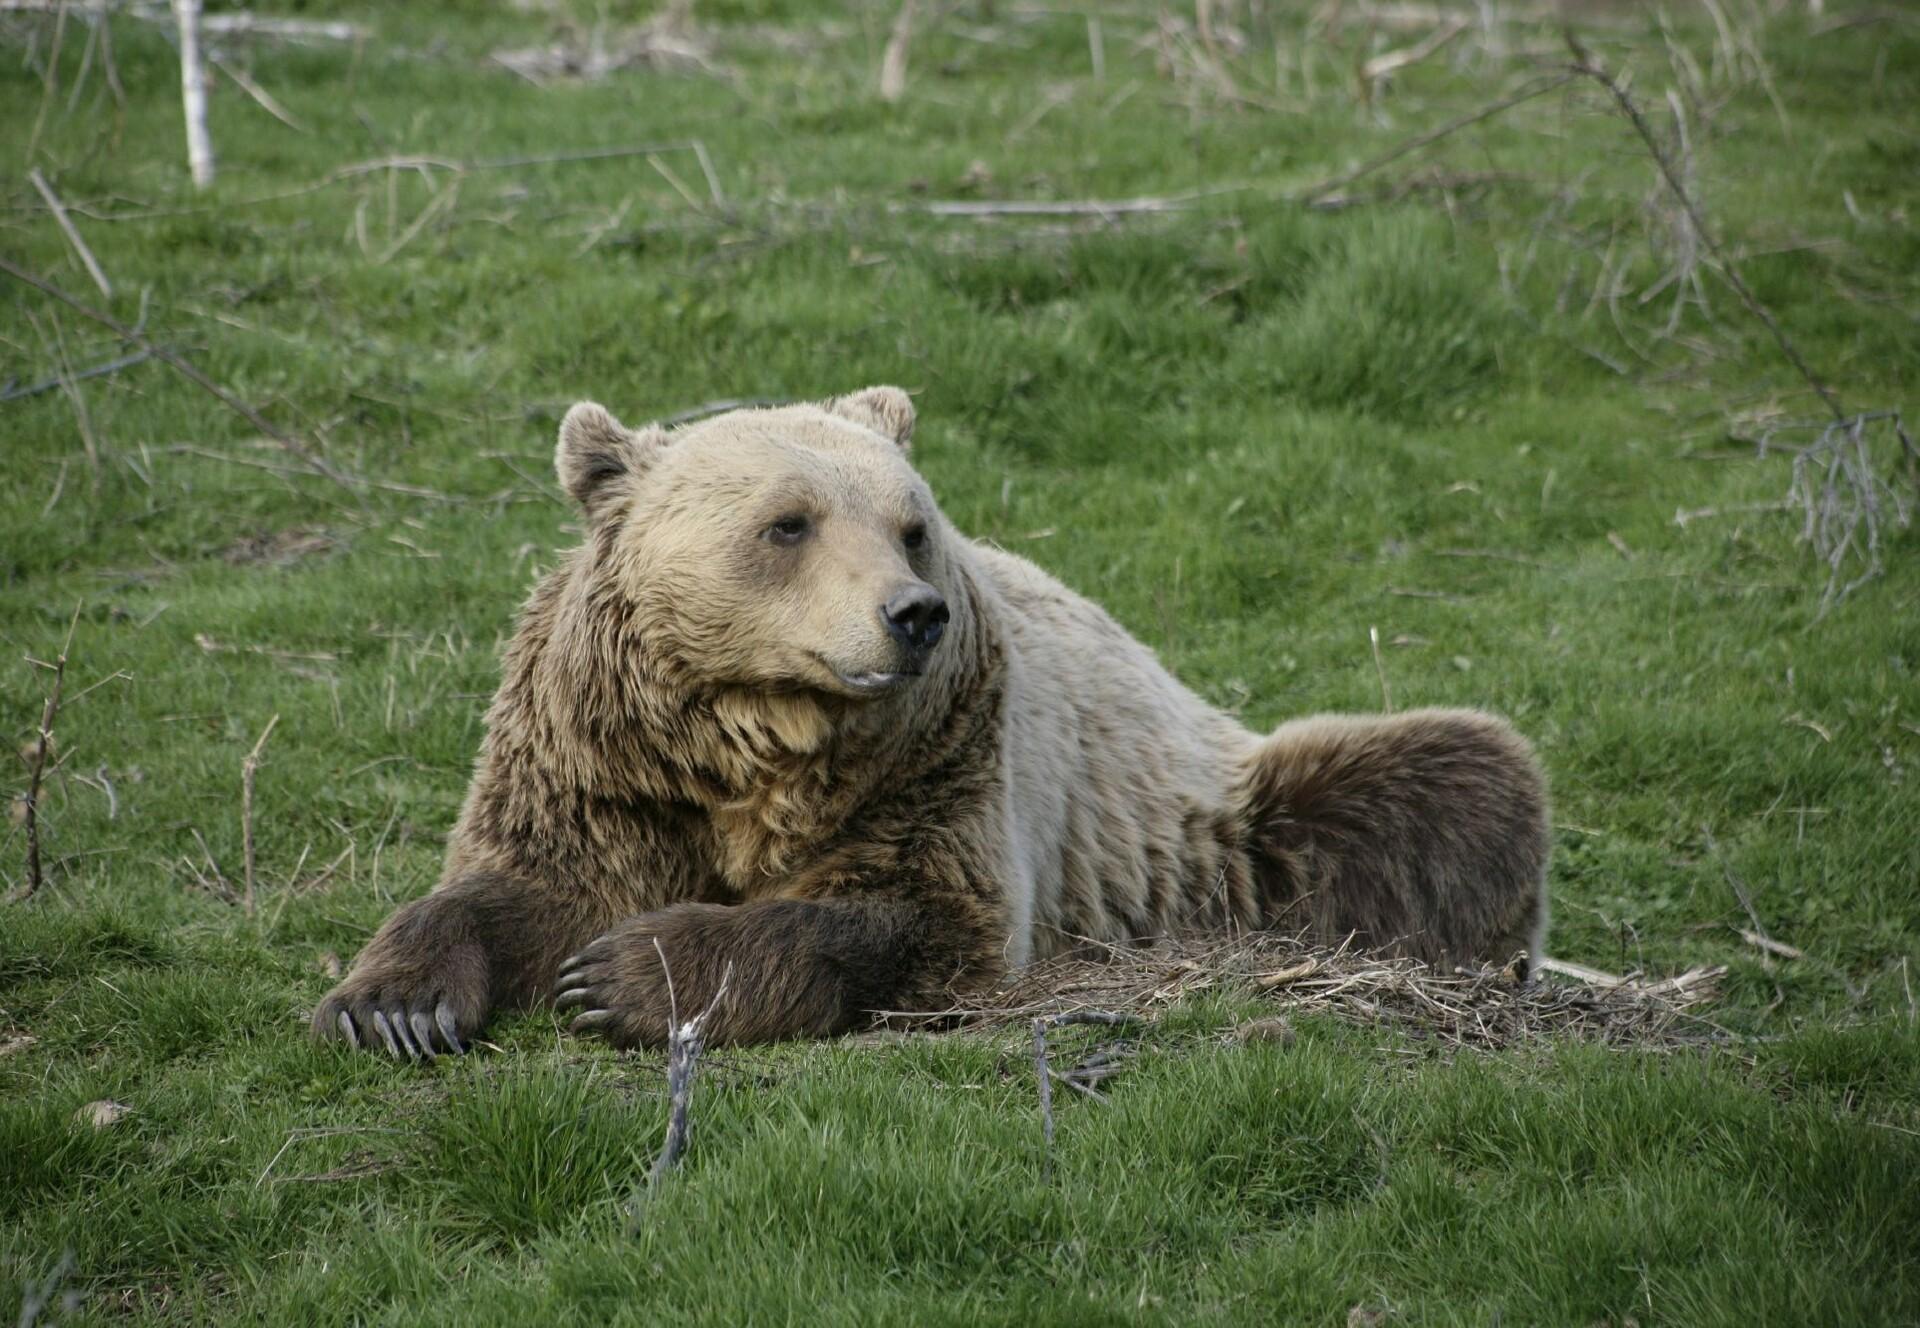 Bear Anik sitting in the grass